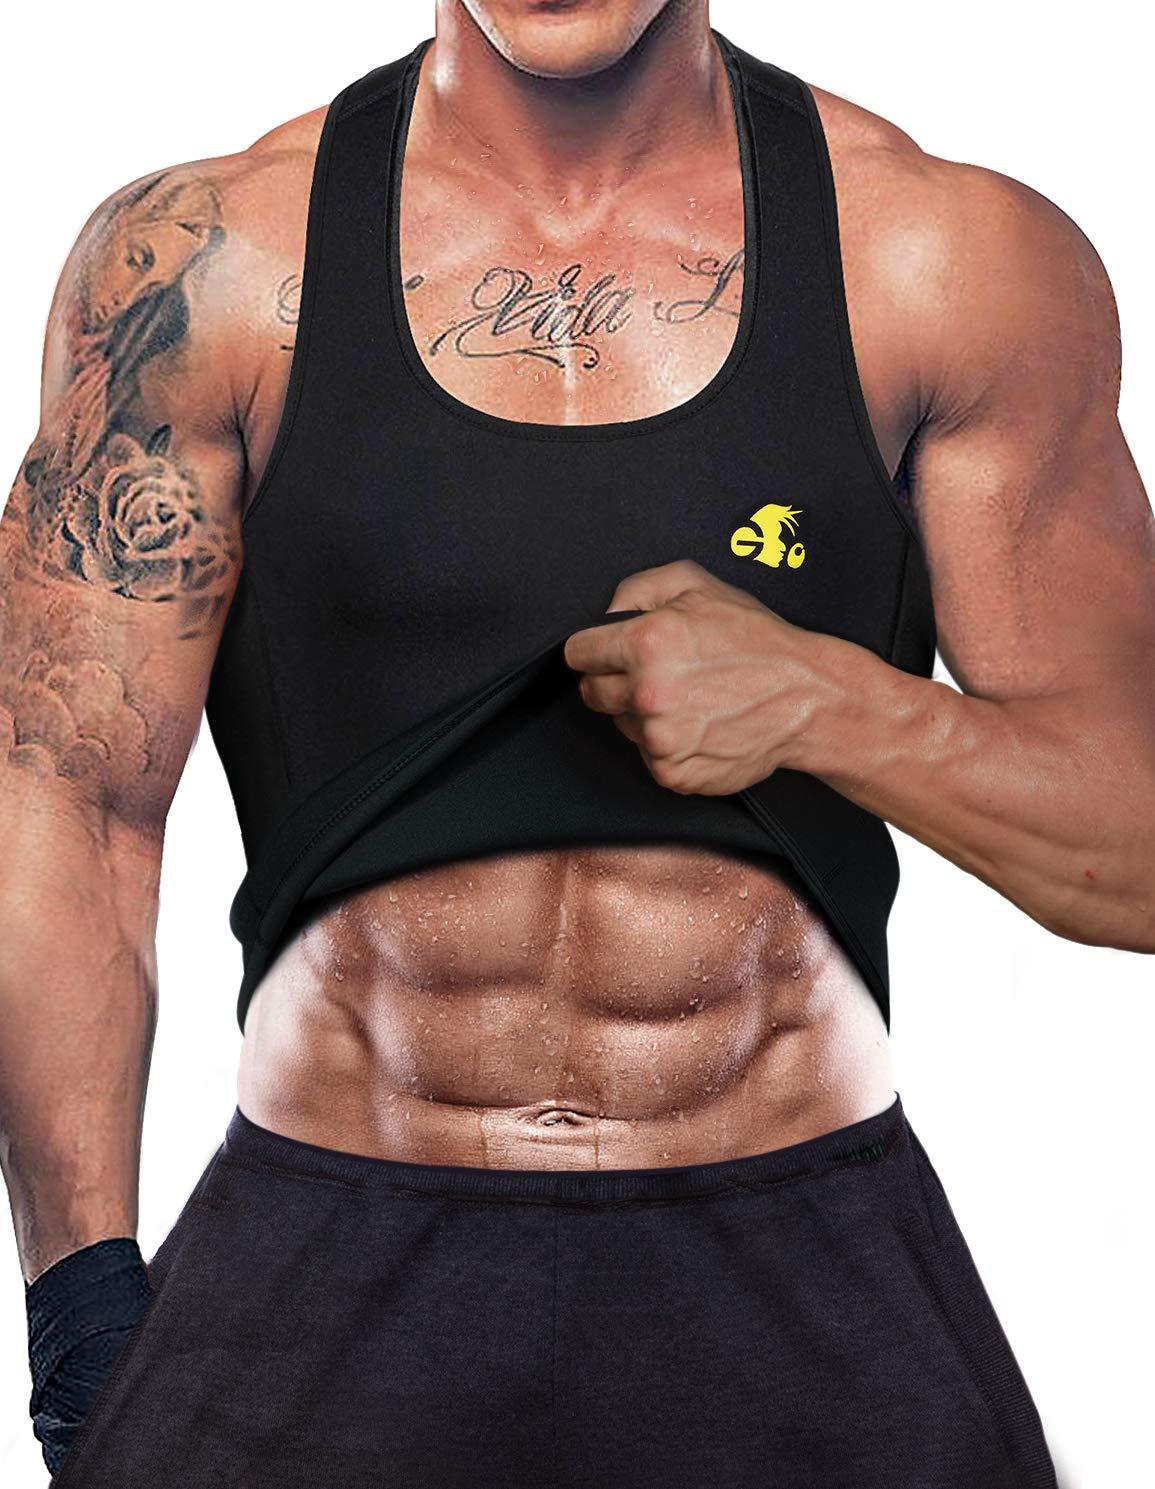 DoLoveY Men Hot Sweat Vest Neoprene Sauna Slimming Suit Weight Loss Tank Top Waist Trainer Shirt